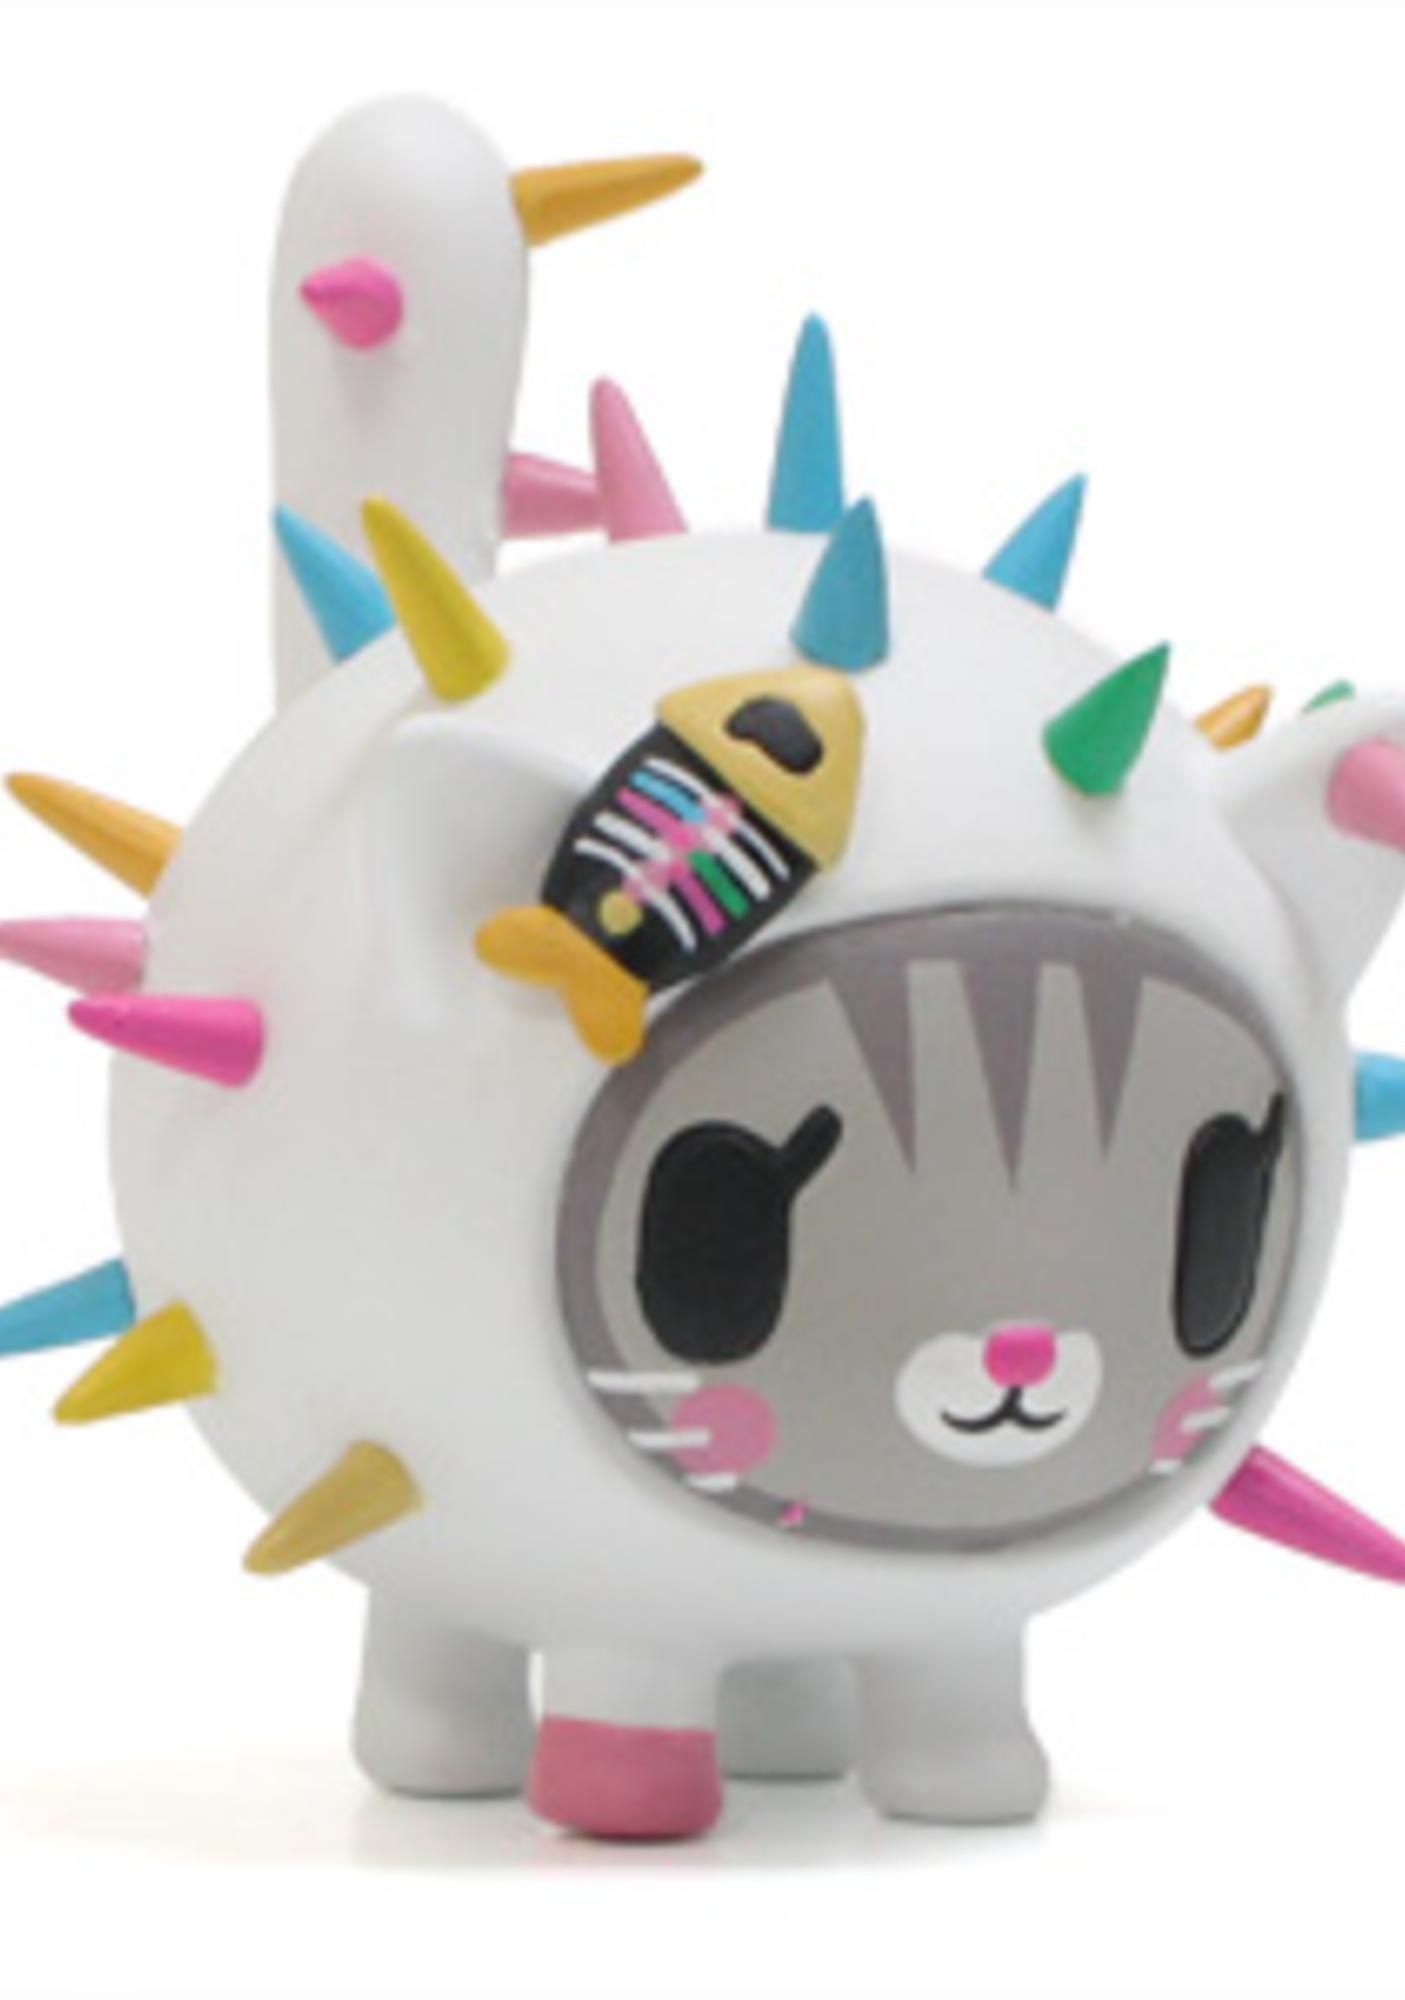 Tokidoki Carina Vinyl Toy